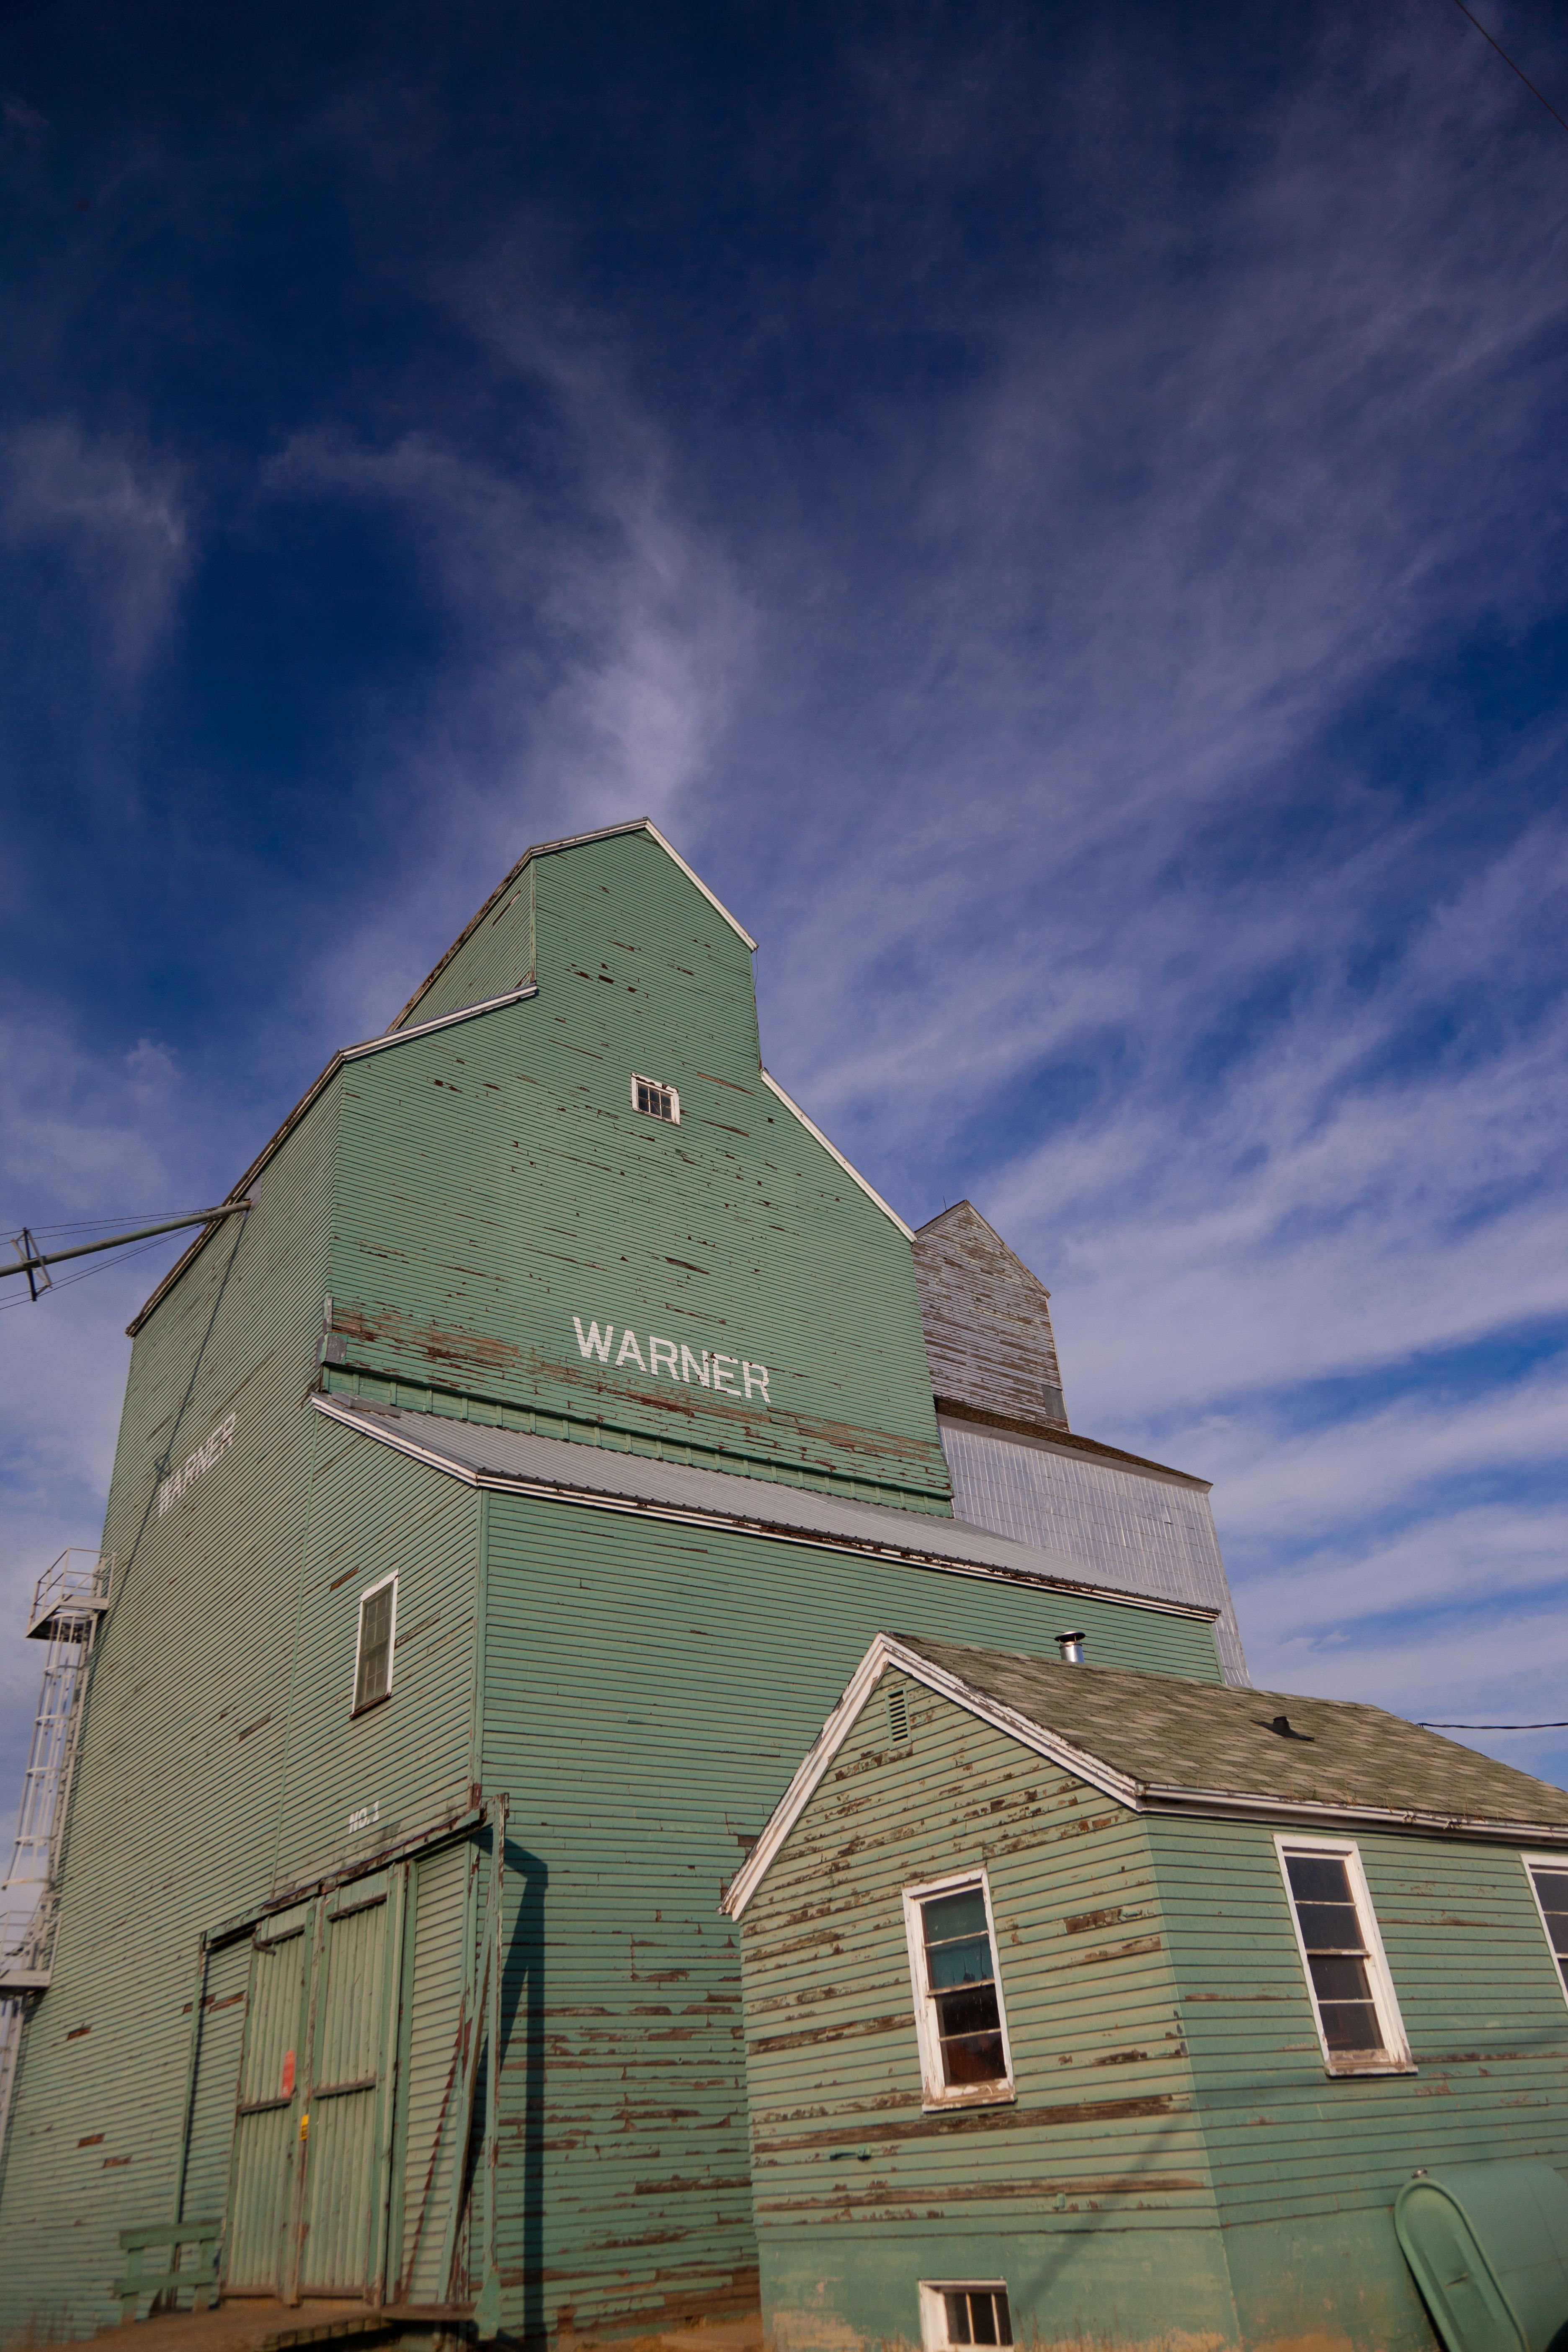 Grain Elevator near Warner, AB http://exploresouthwestalberta.ca